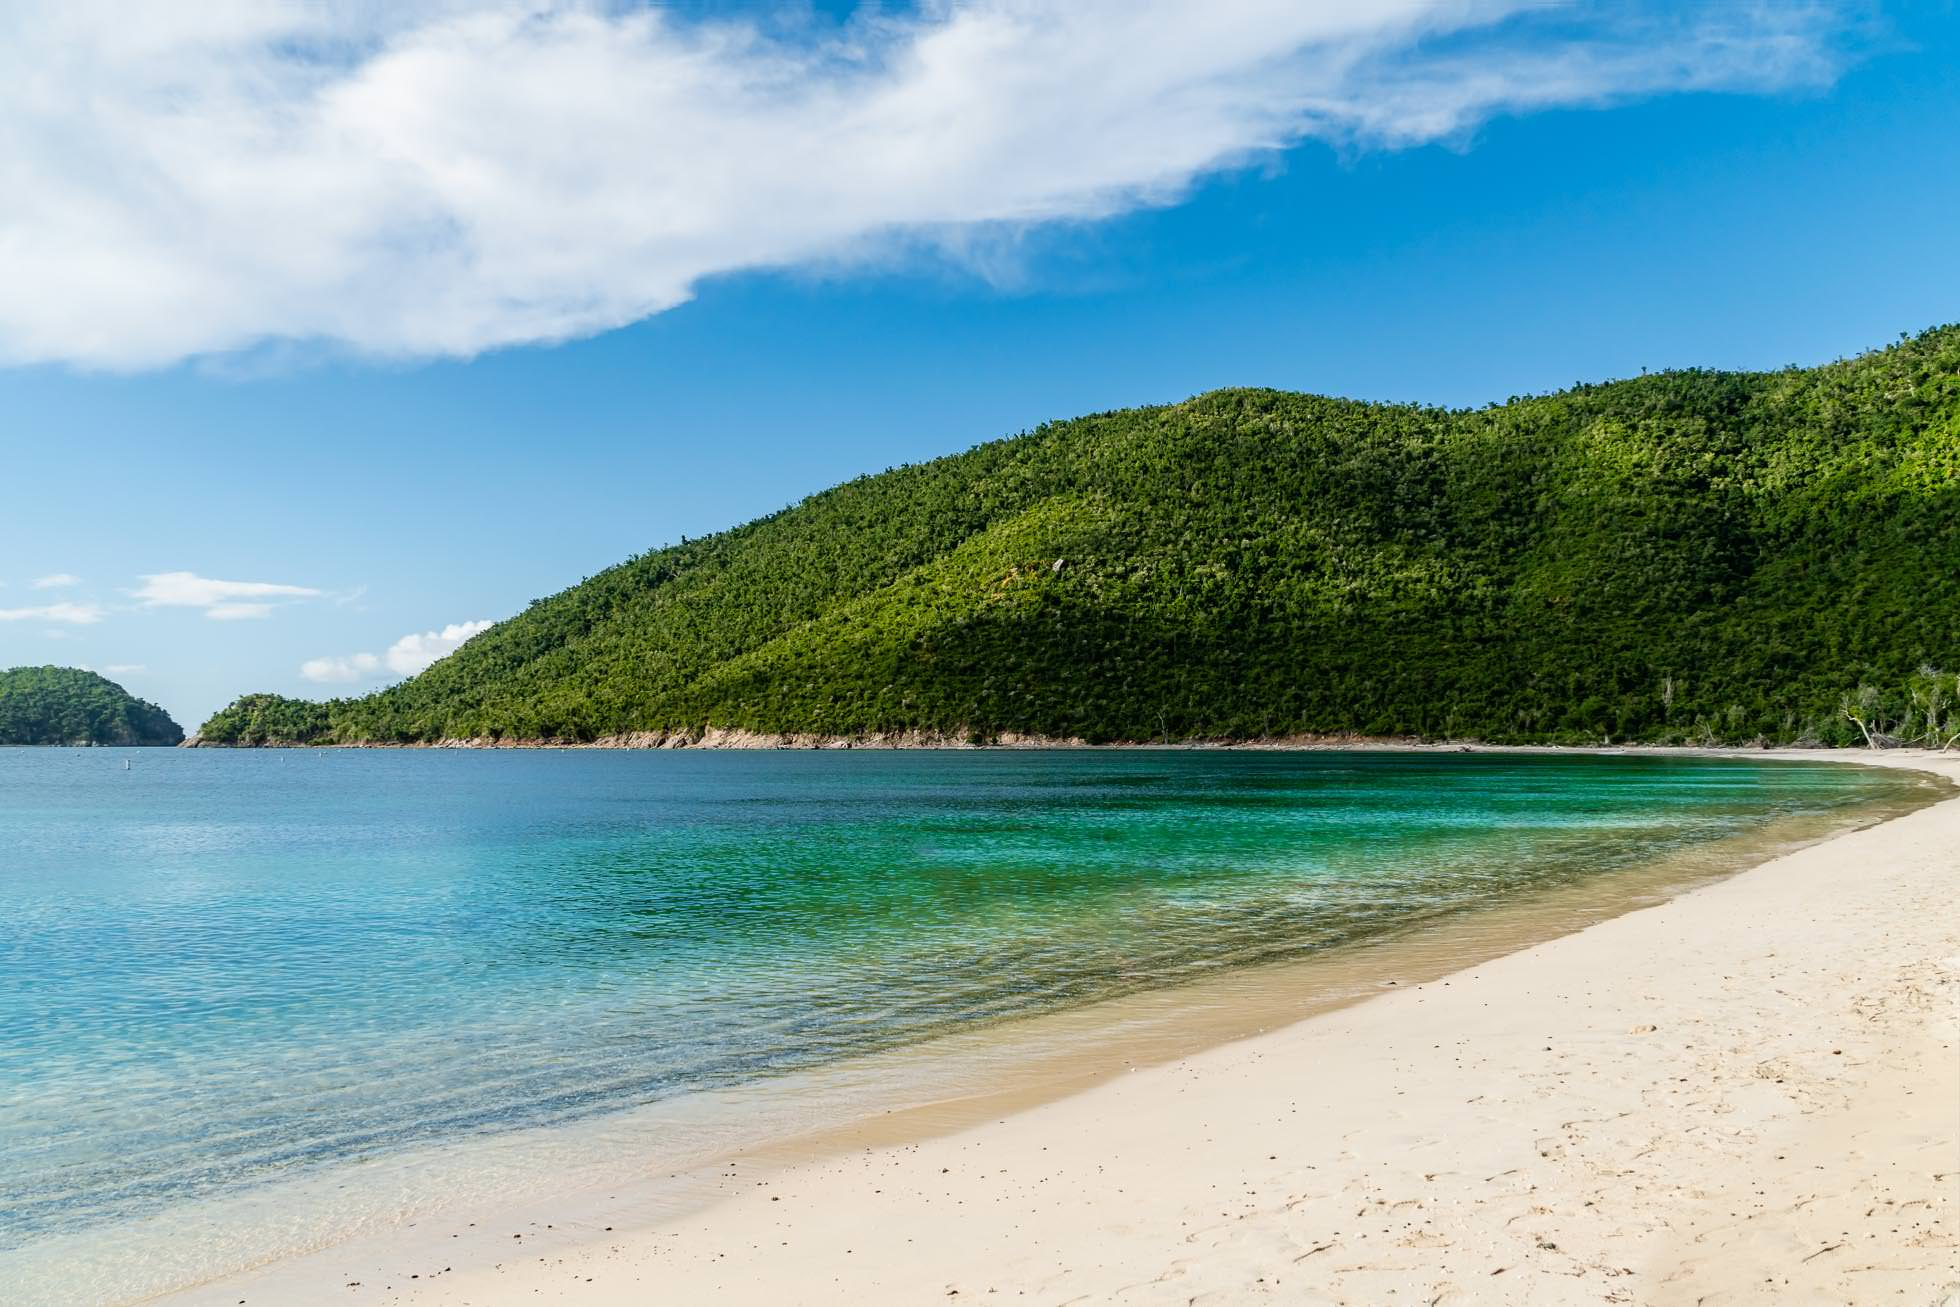 st john, us virgin islands national park